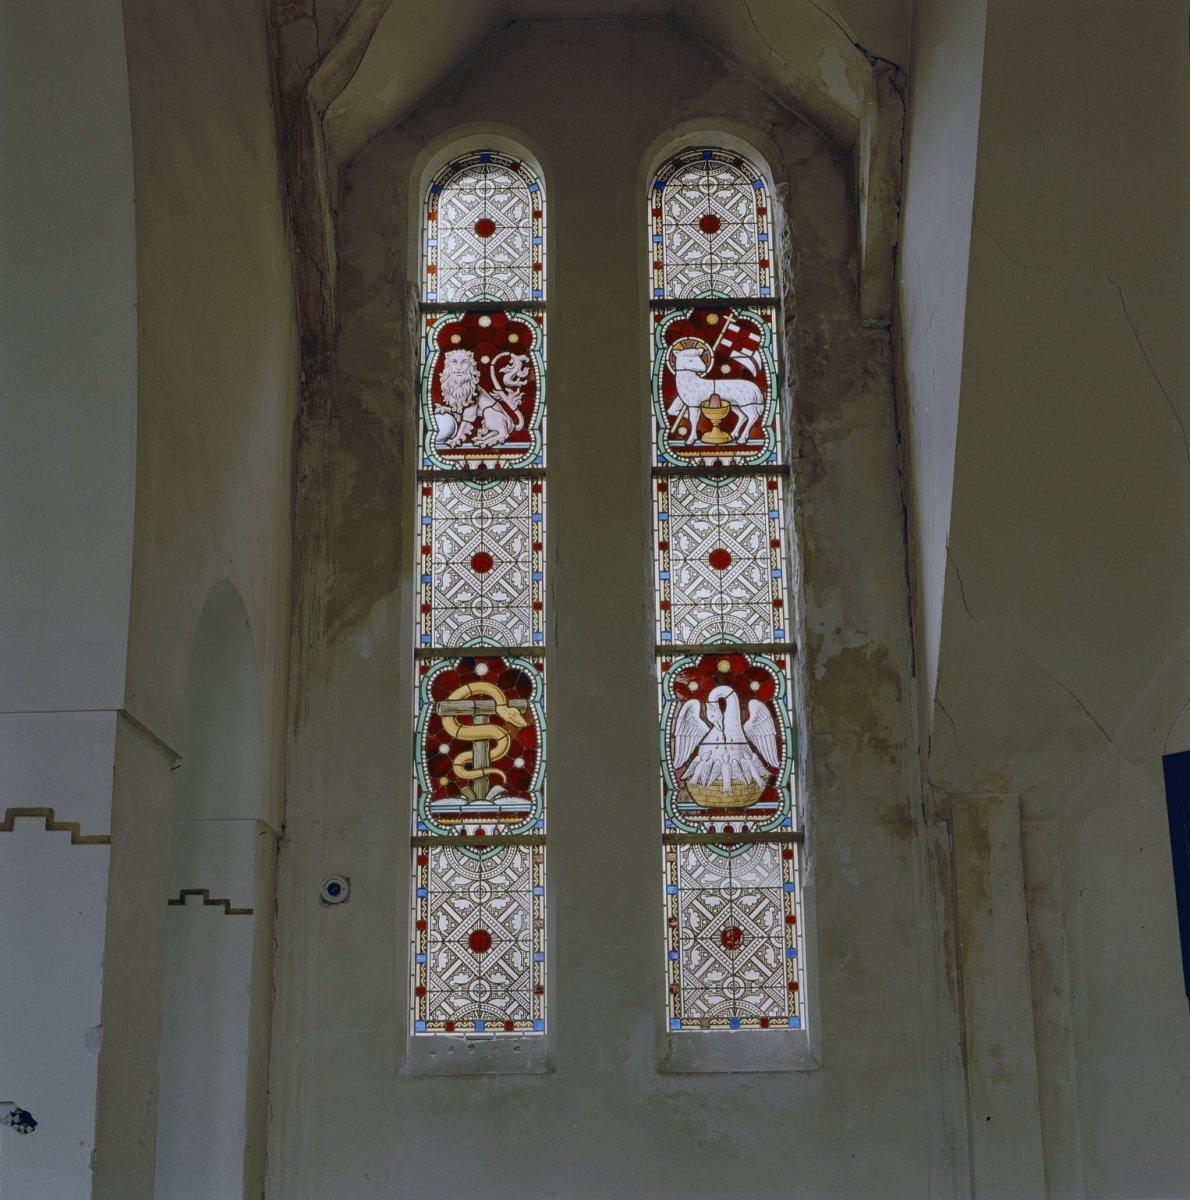 Datei:Interieur voormalig koor, glas in loodramen met ...